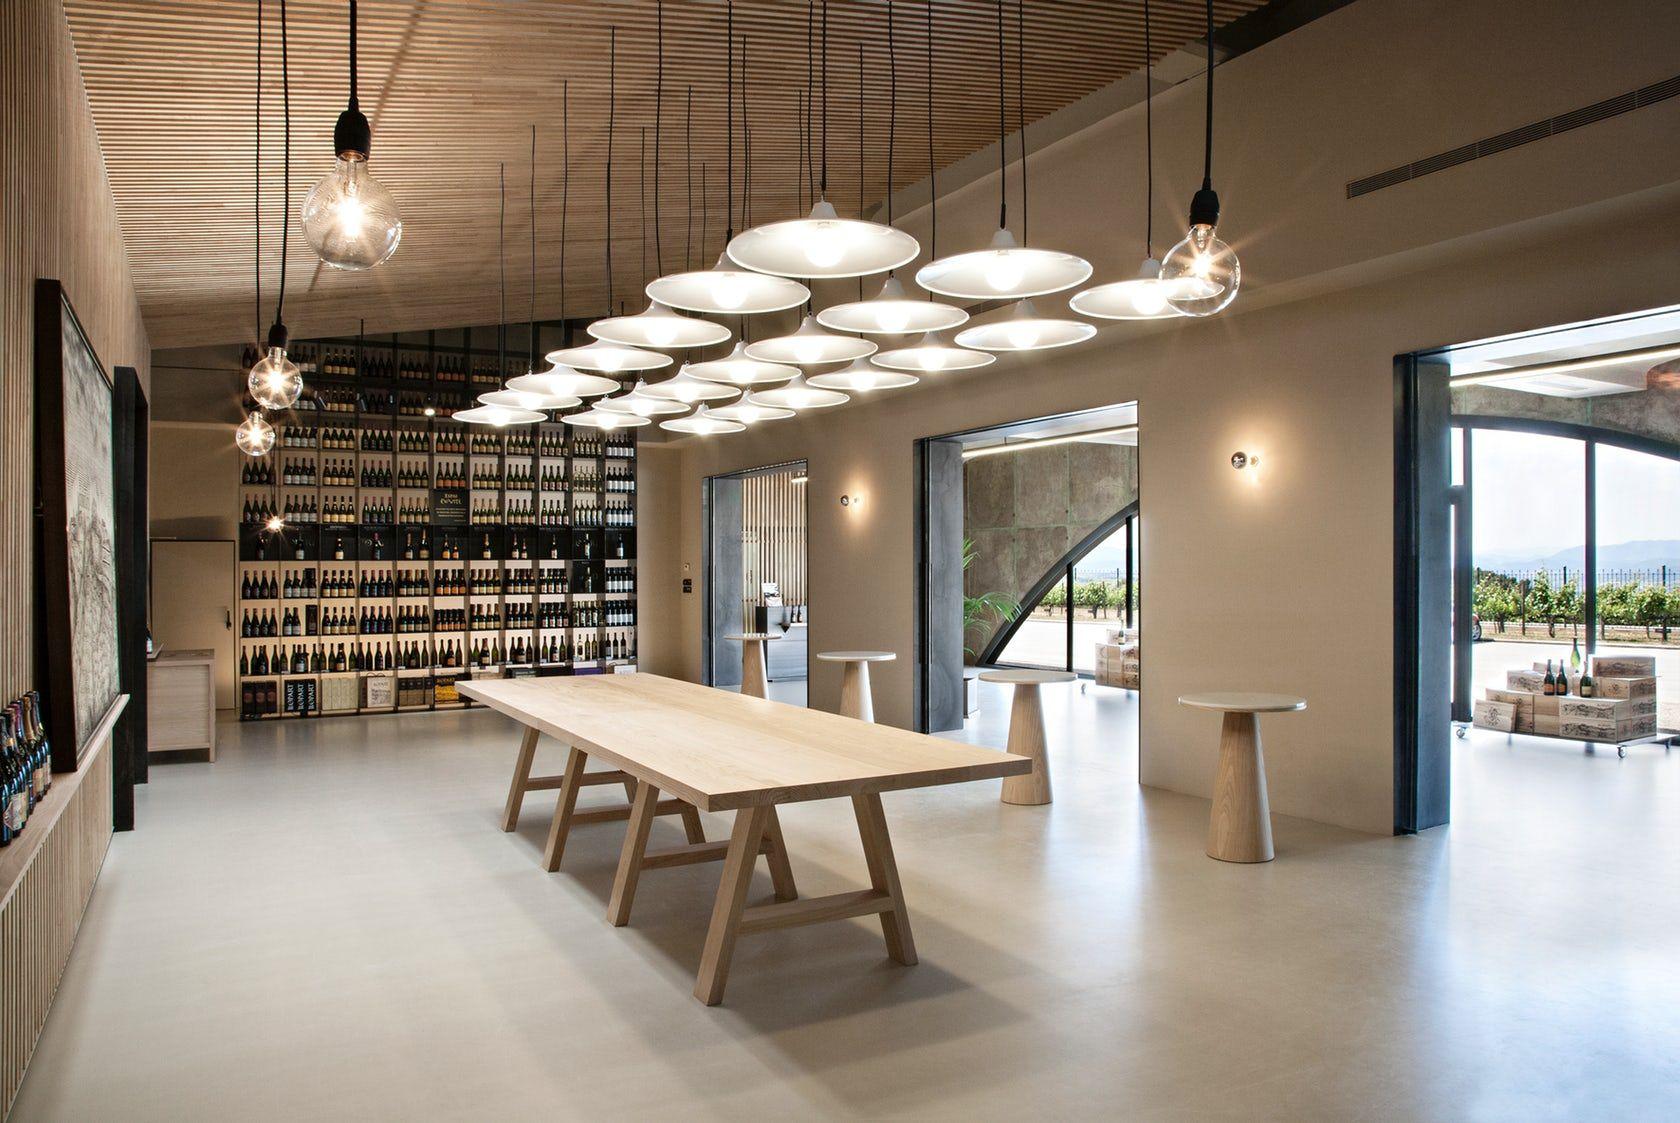 14739389072540008 Jpg 1 680 1 123 Pixeles Sant Sadurni D Anoia Decor Interior Design Interior And Exterior